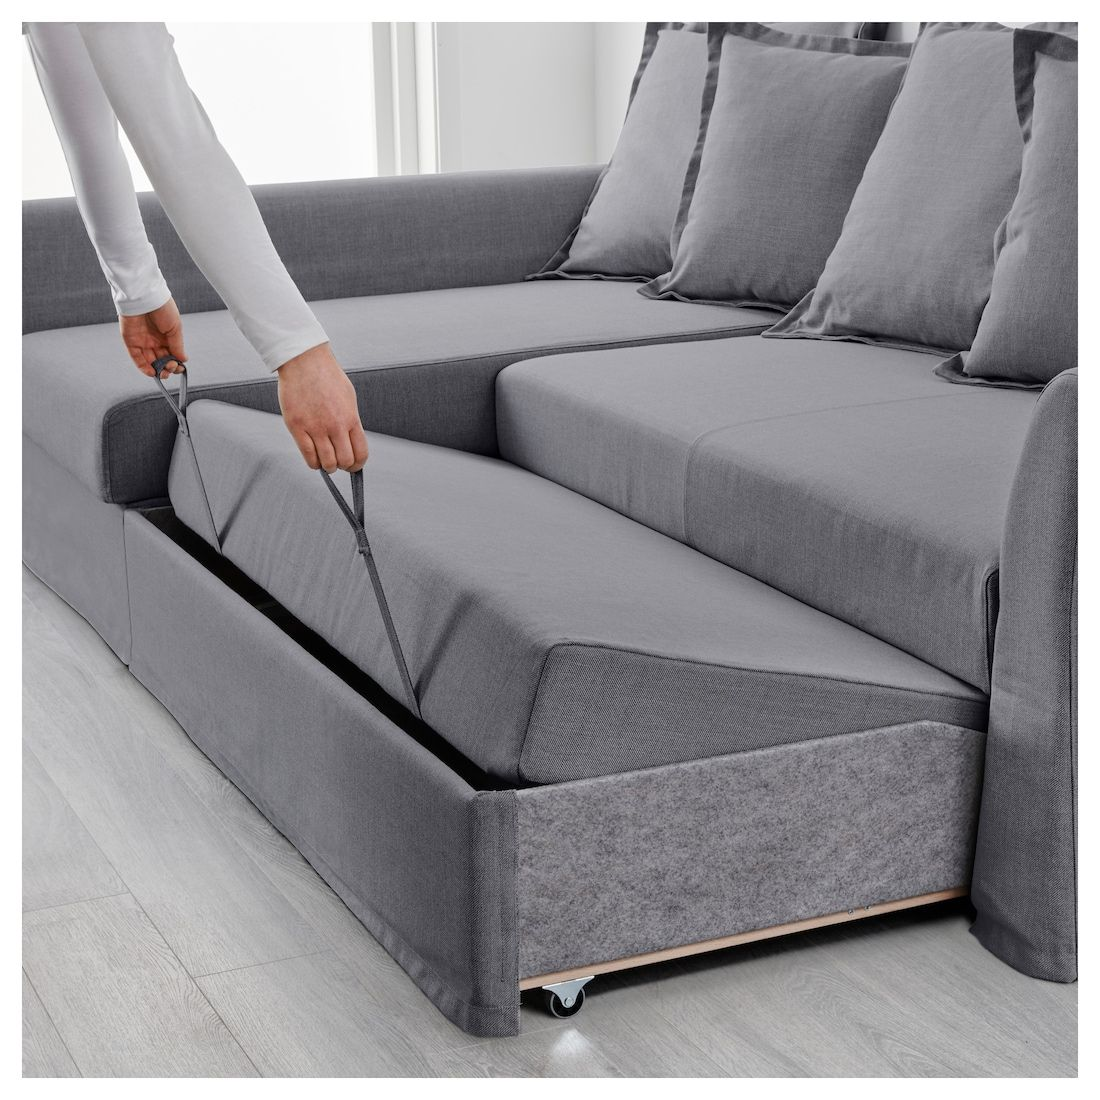 Holmsund Sleeper Sectional 3 Seat Nordvalla Medium Gray Ikea Sectional Sleeper Sofa Corner Sofa Bed Ikea Sofa Bed